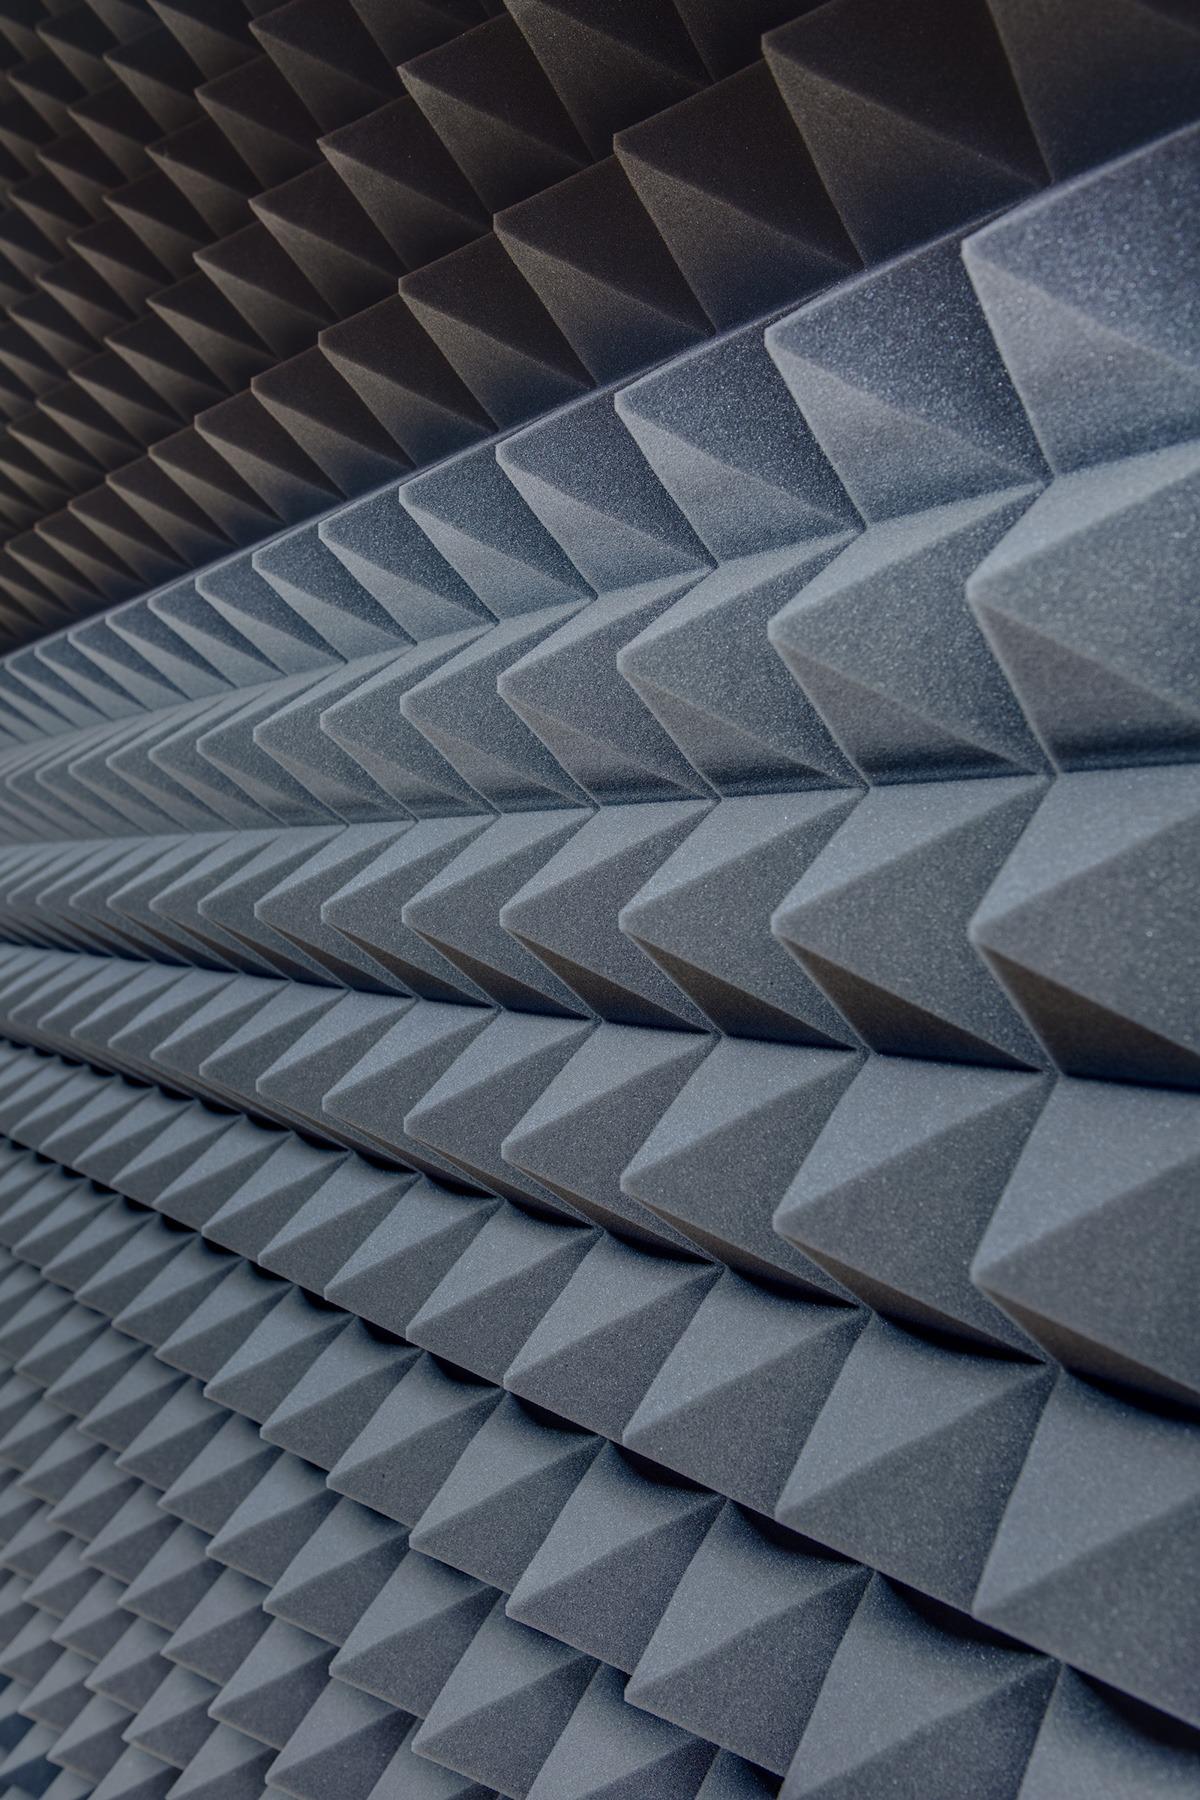 Soundproof Bedroom Sound Proofing Interior Design Ideas